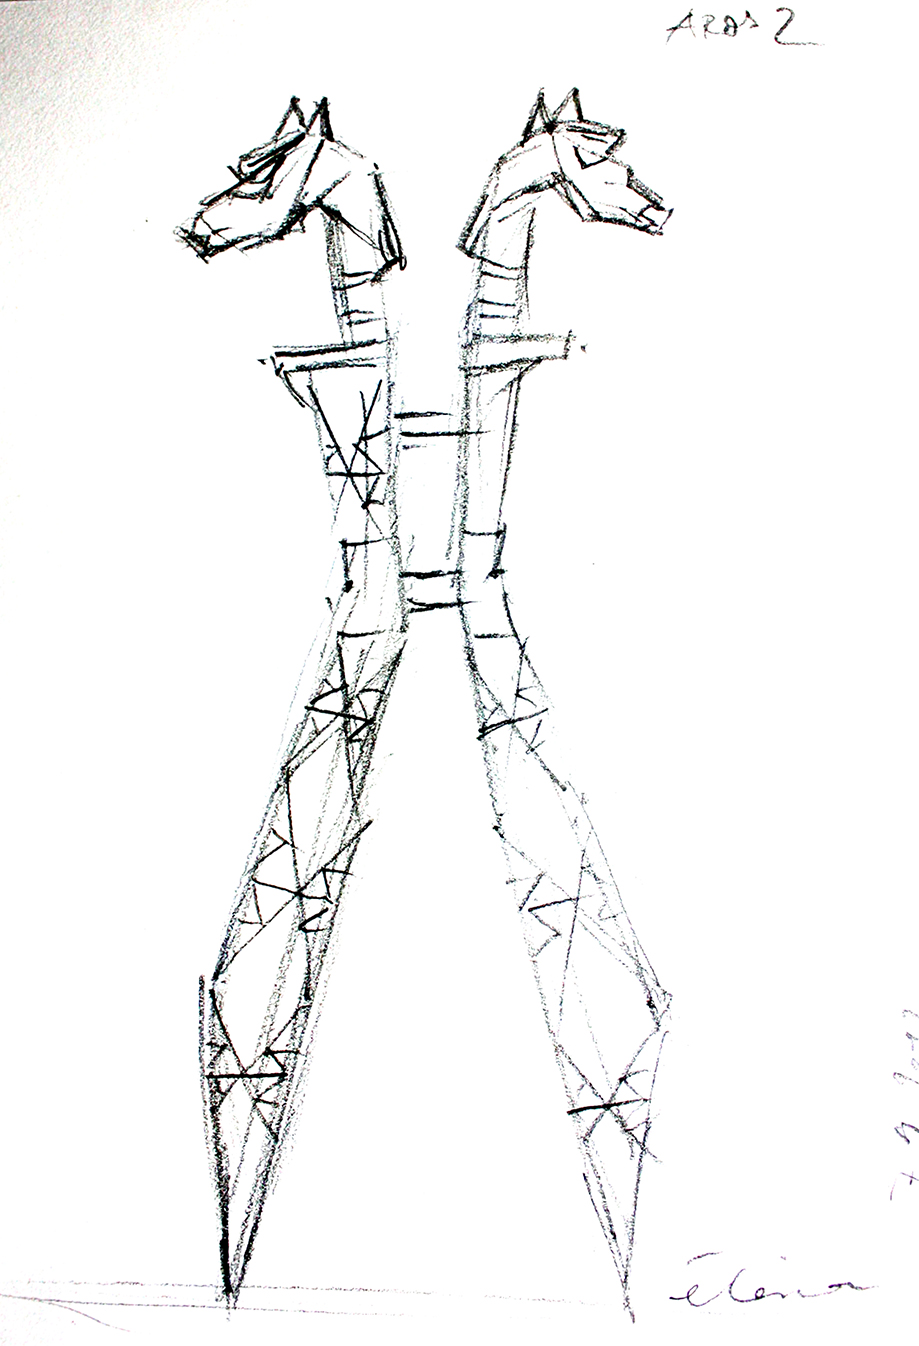 Aros, Viking pylon